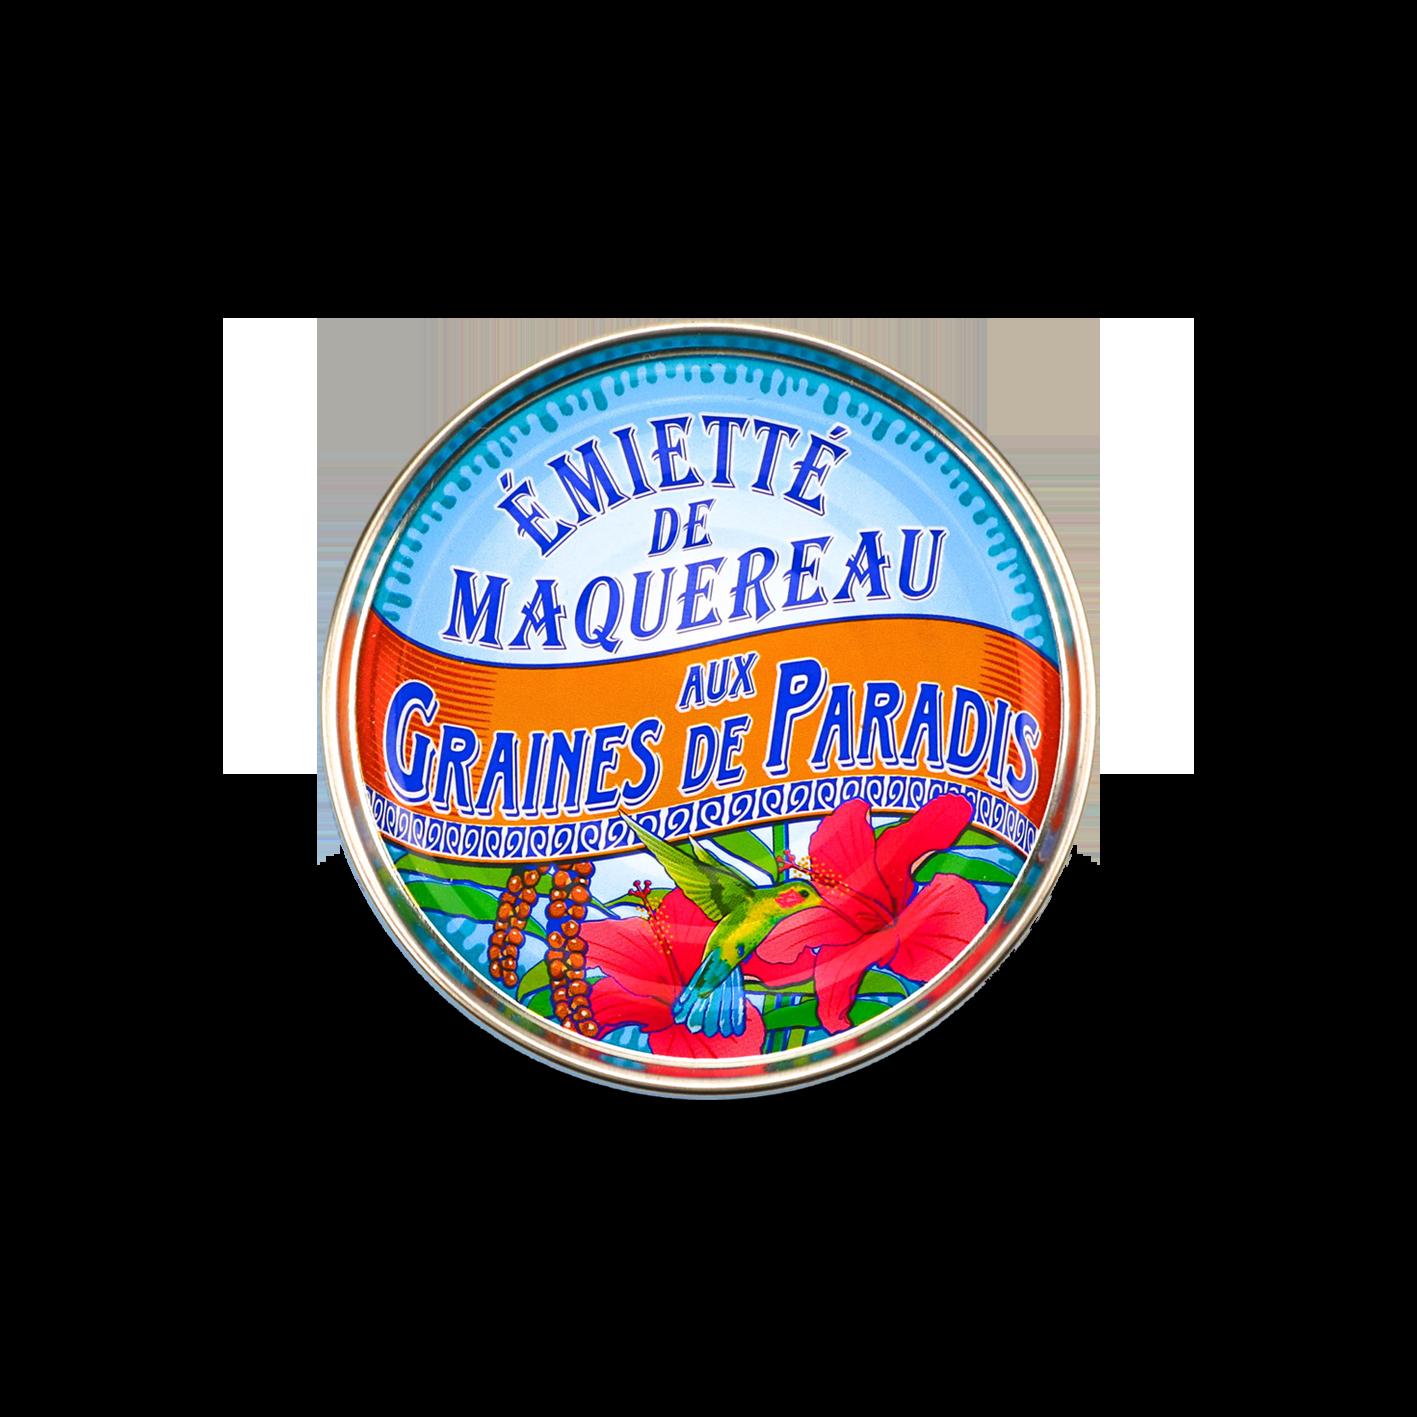 La belle-iloise - Émietté van makreel met paradijskorrels 80gr.